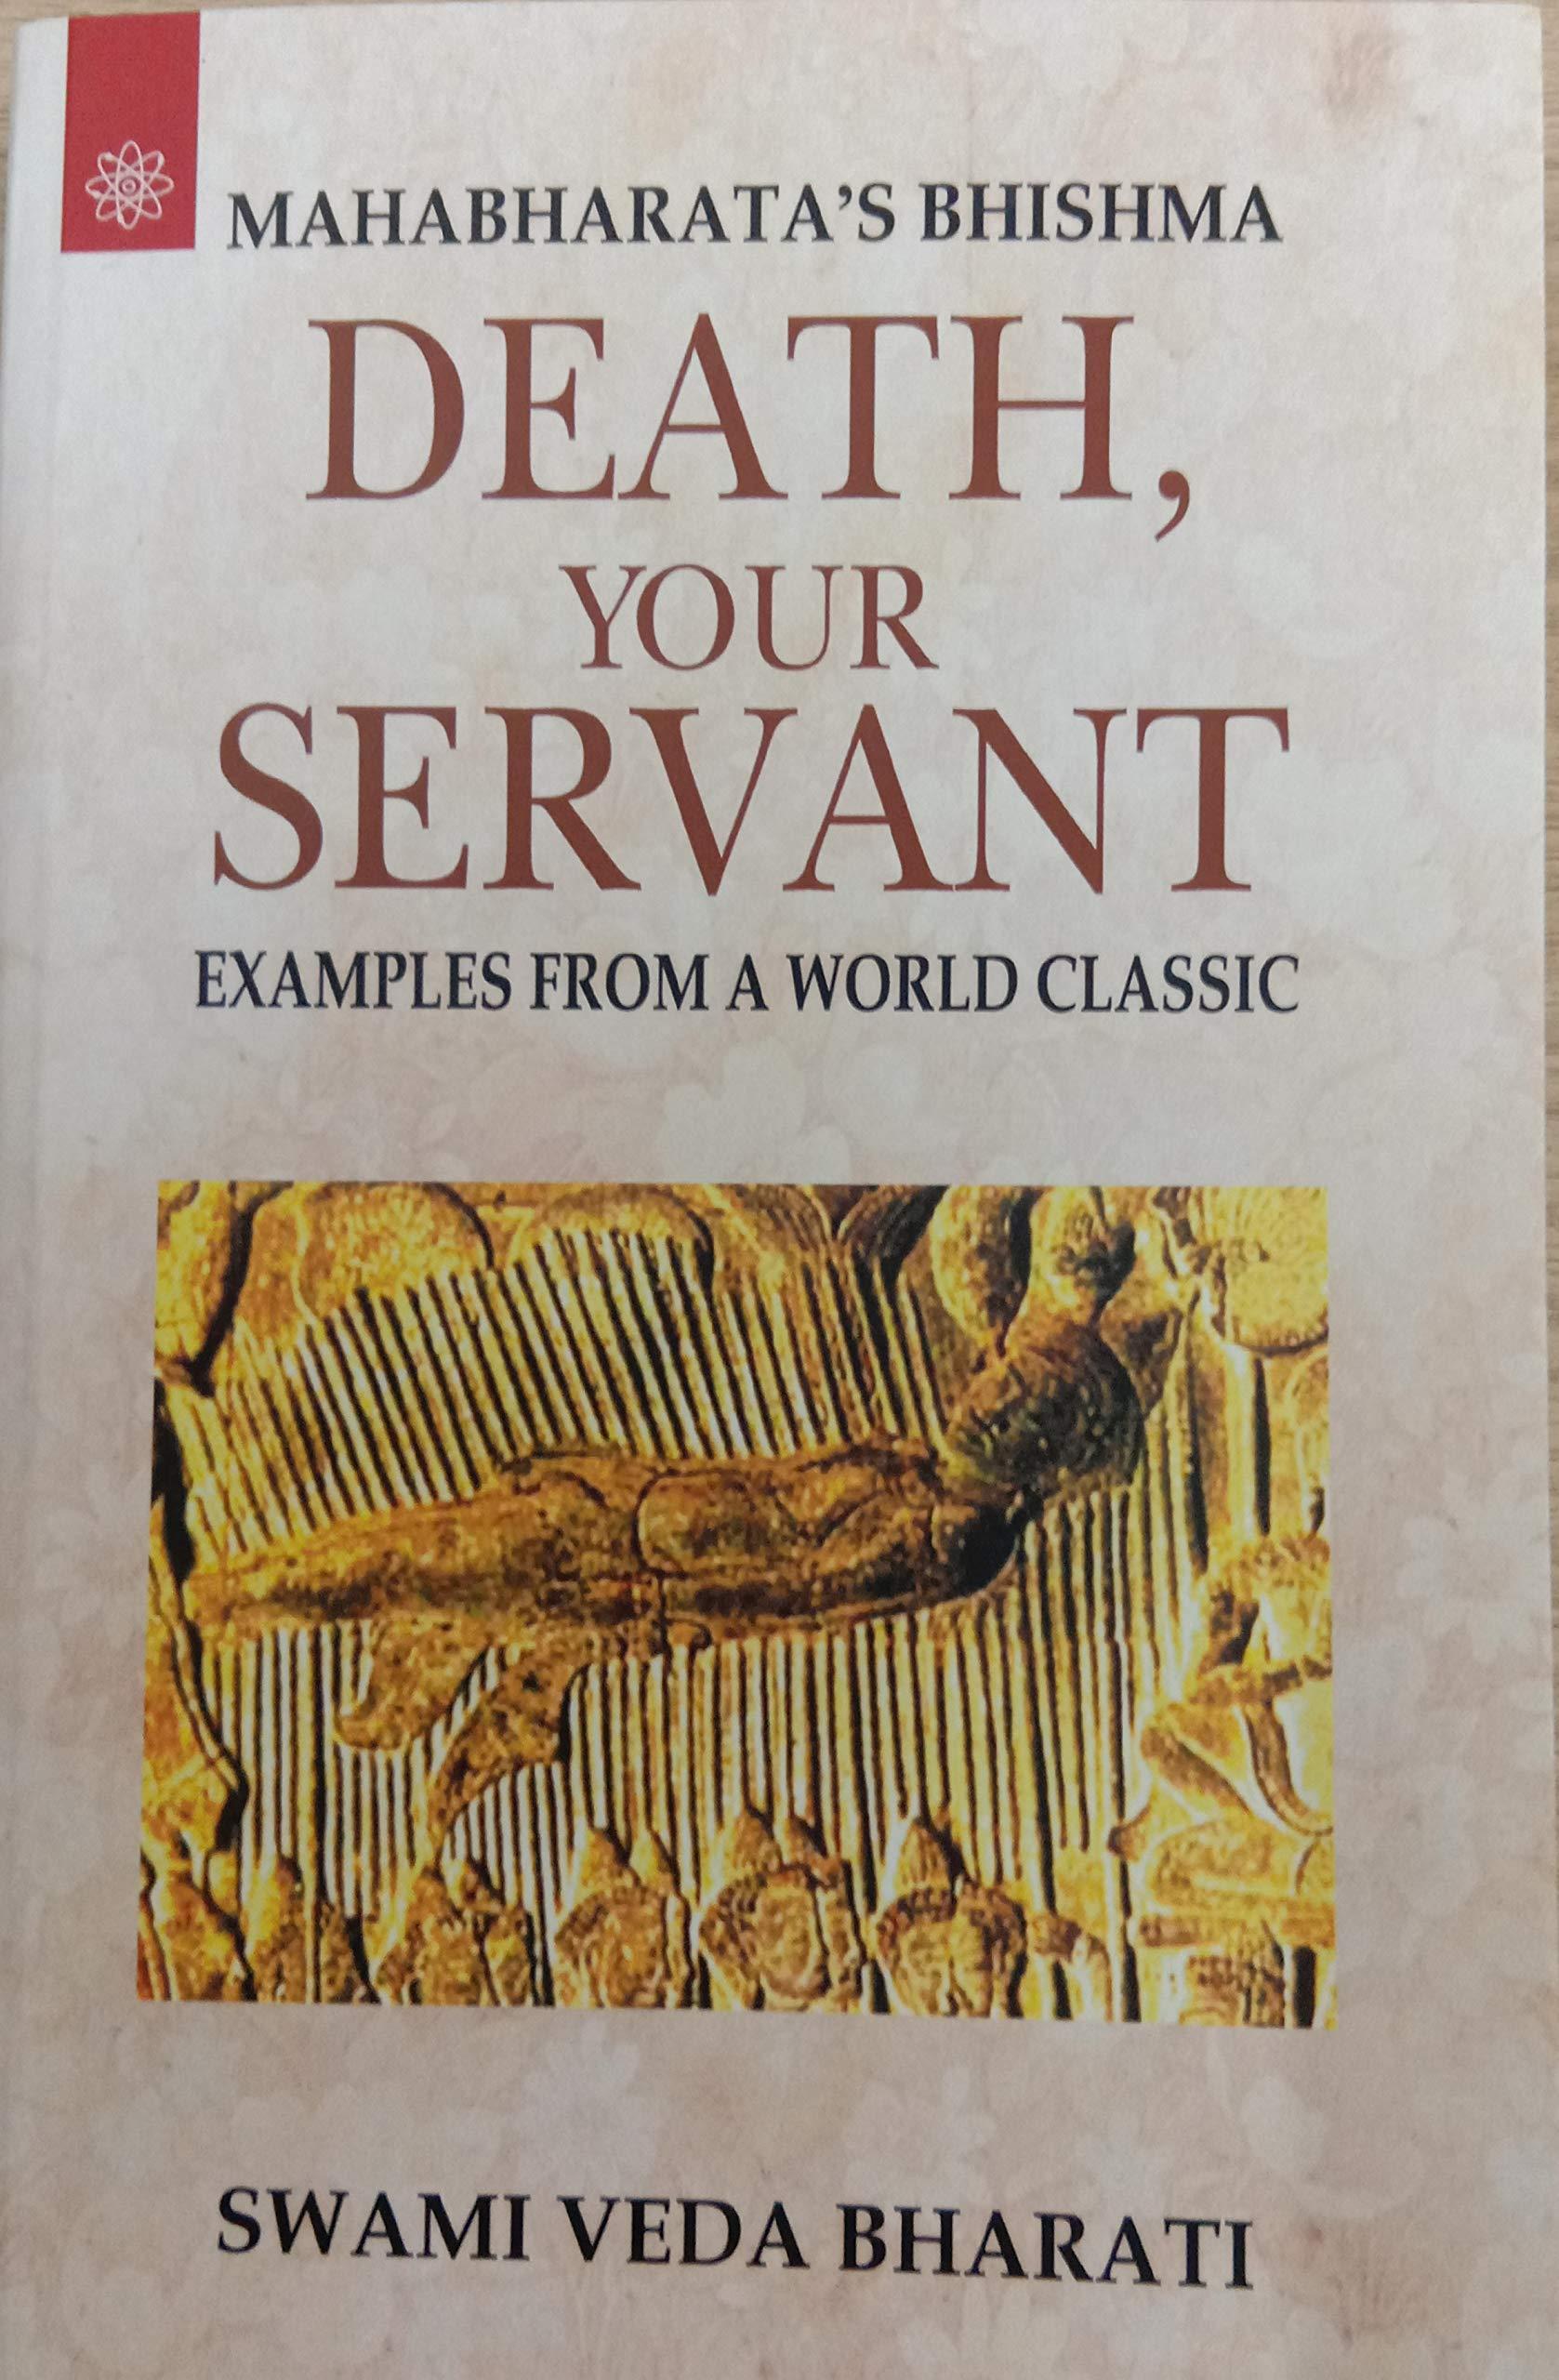 Mahabharata S Bhishma Death Your Servant Examples From A World Classic Swami Veda Bharati 9788178224831 Amazon Com Books